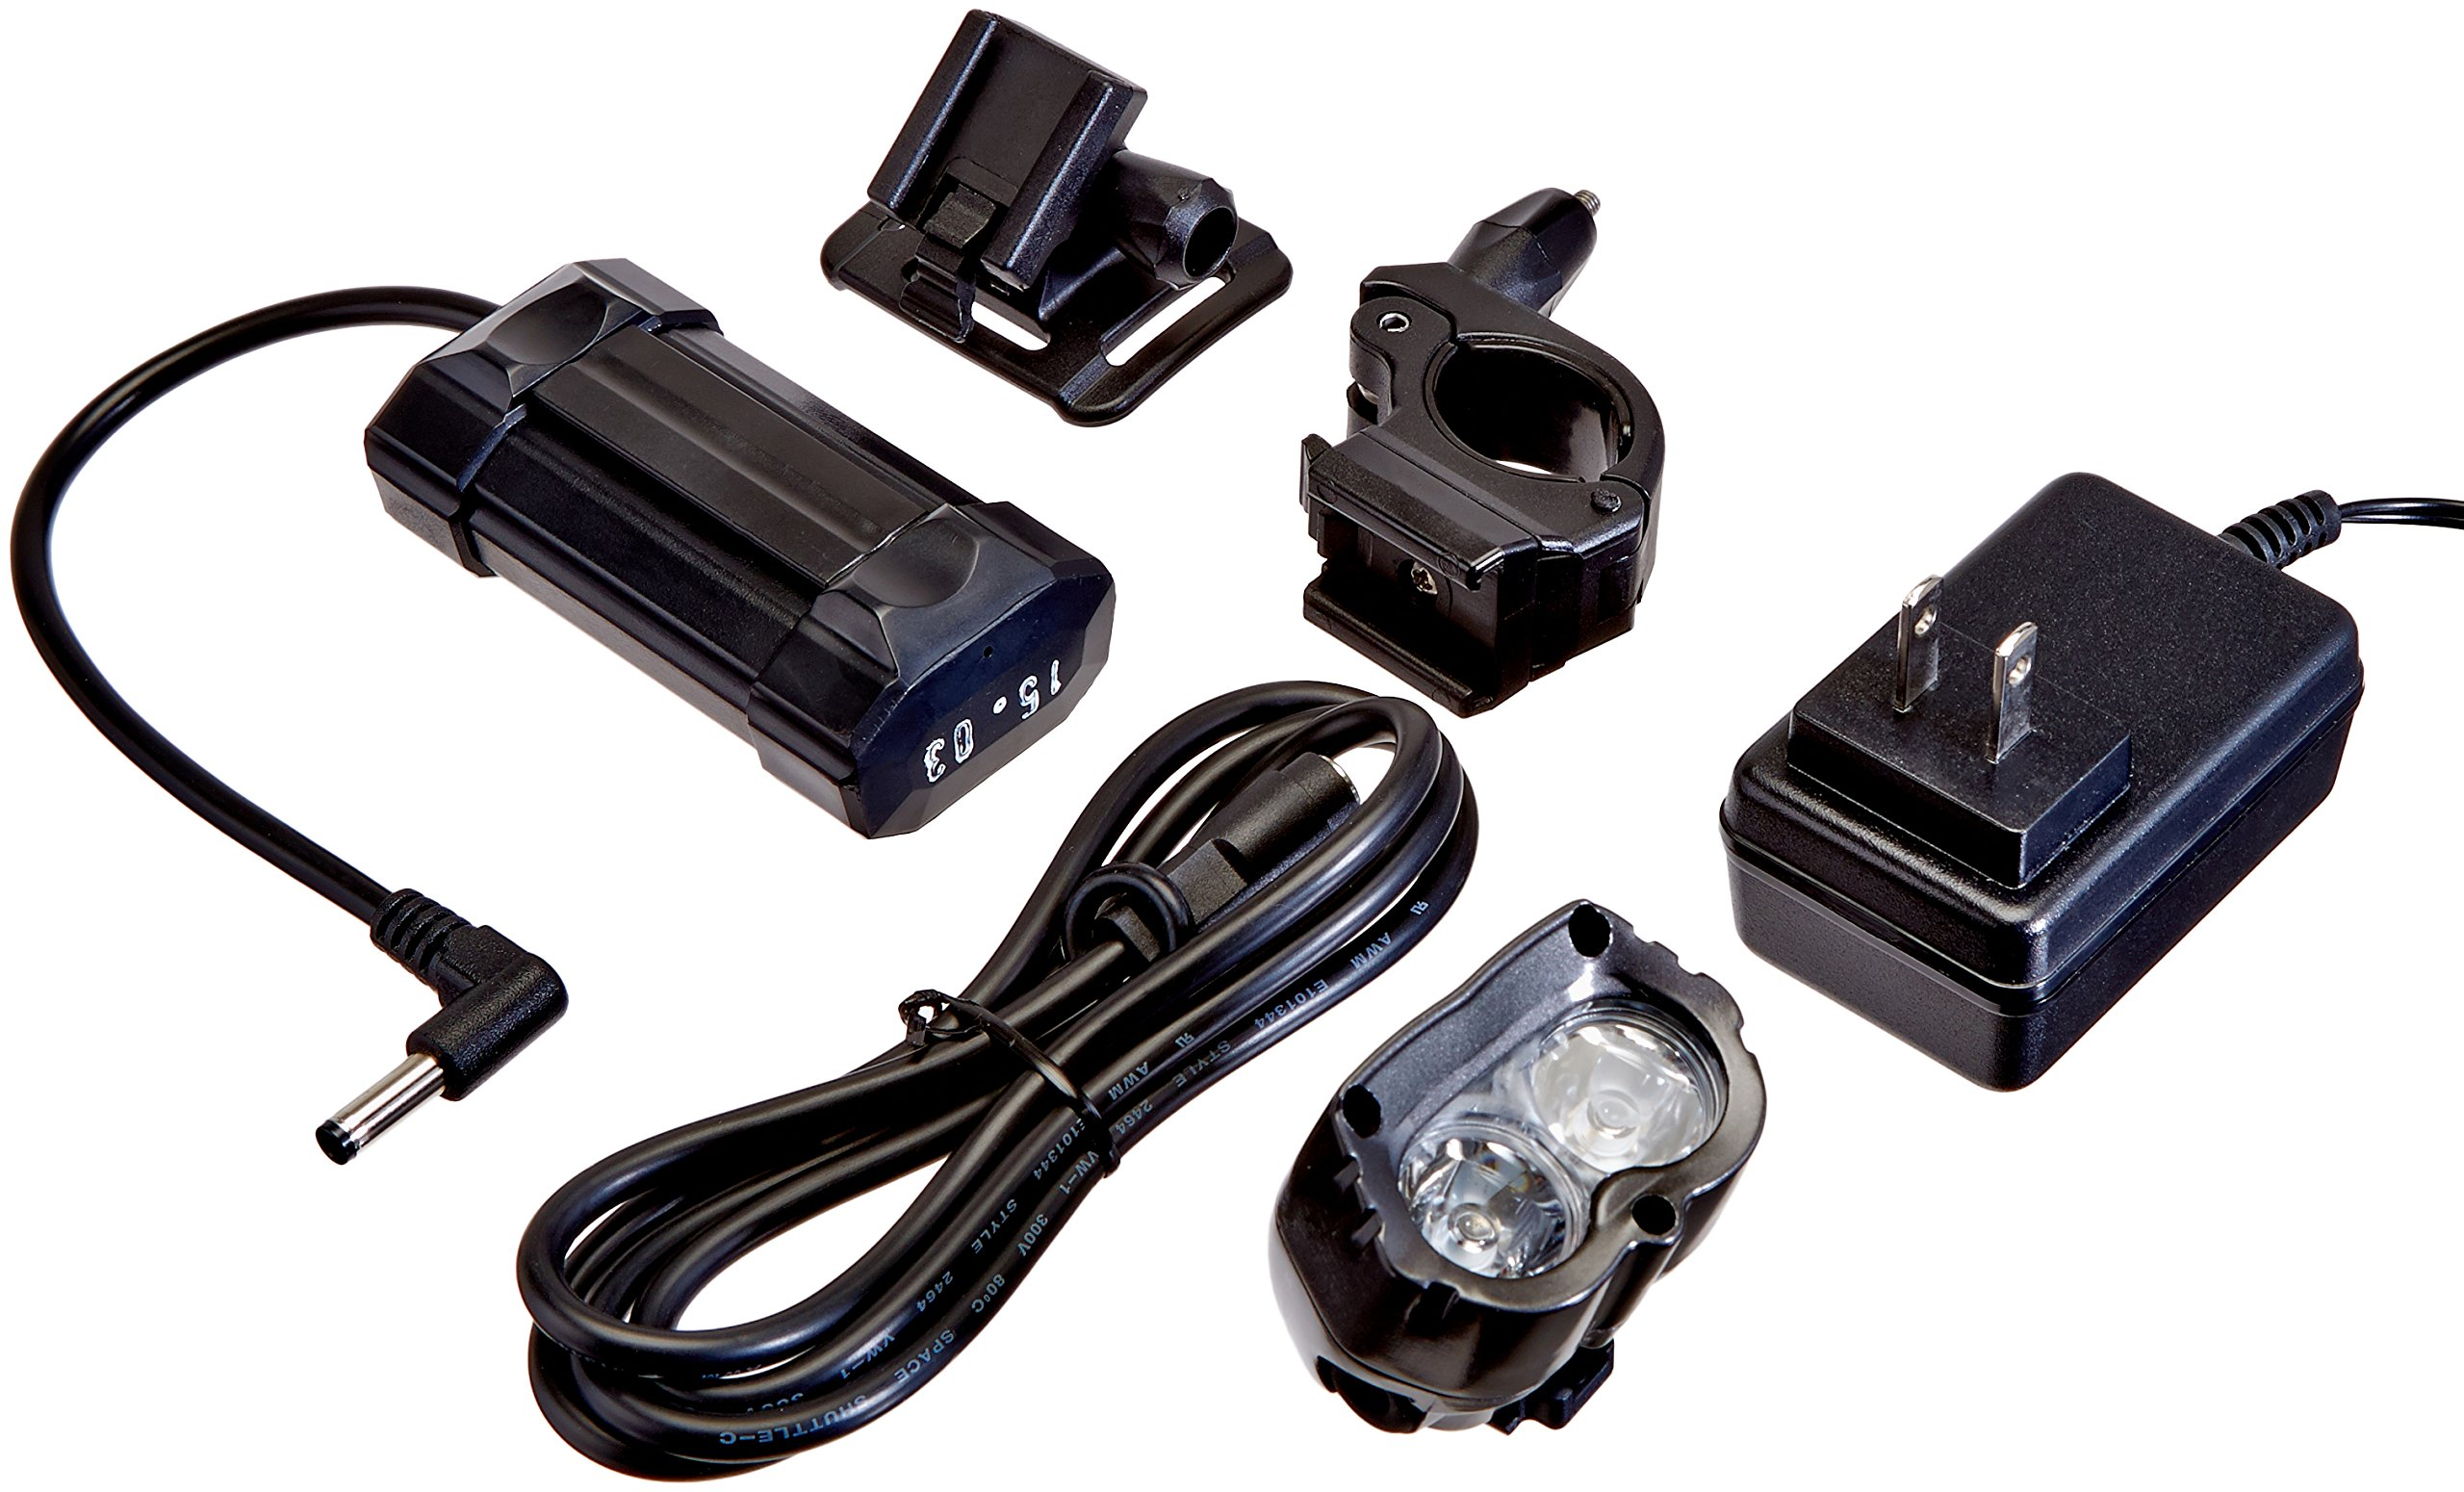 Cygolite MityCross OSP 800 Lumen Programmable Bicycle Headlight, Gray, One Size